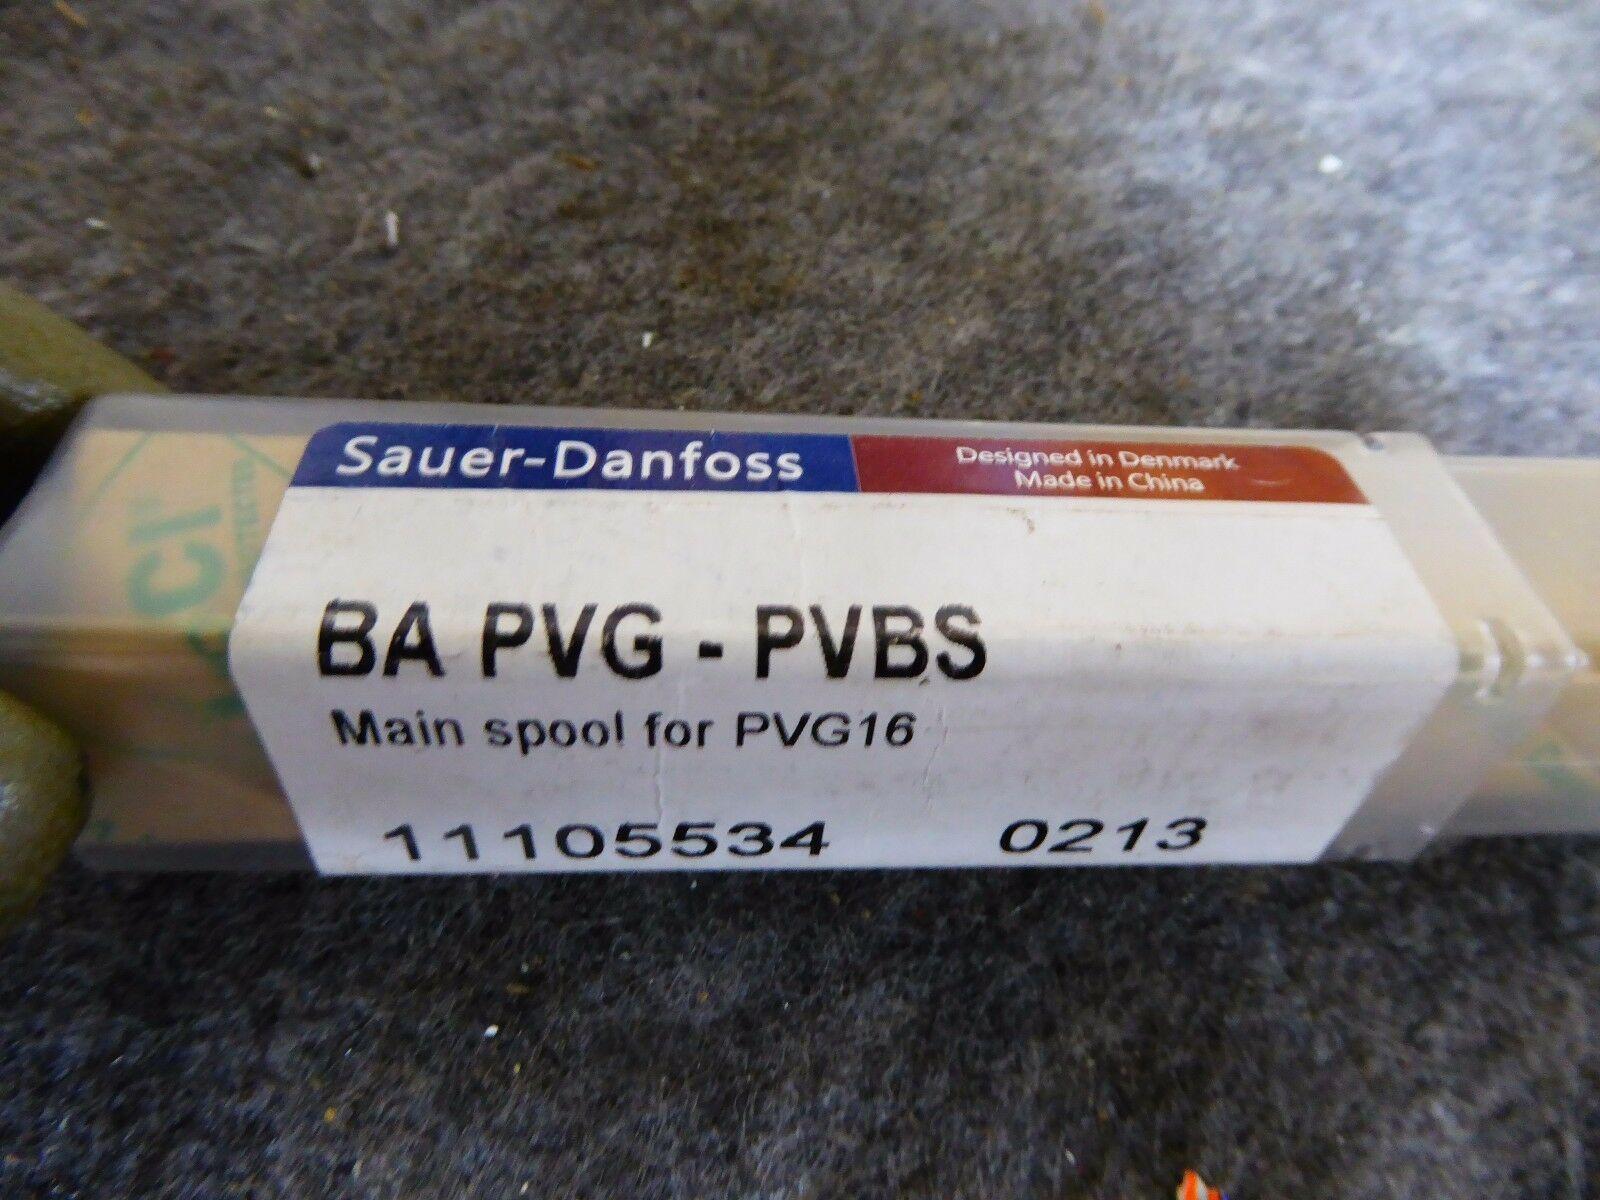 Sauer Danfoss BA PVG-PVBS Main Spool for PVG16 Proportional Valve 11105534 0213